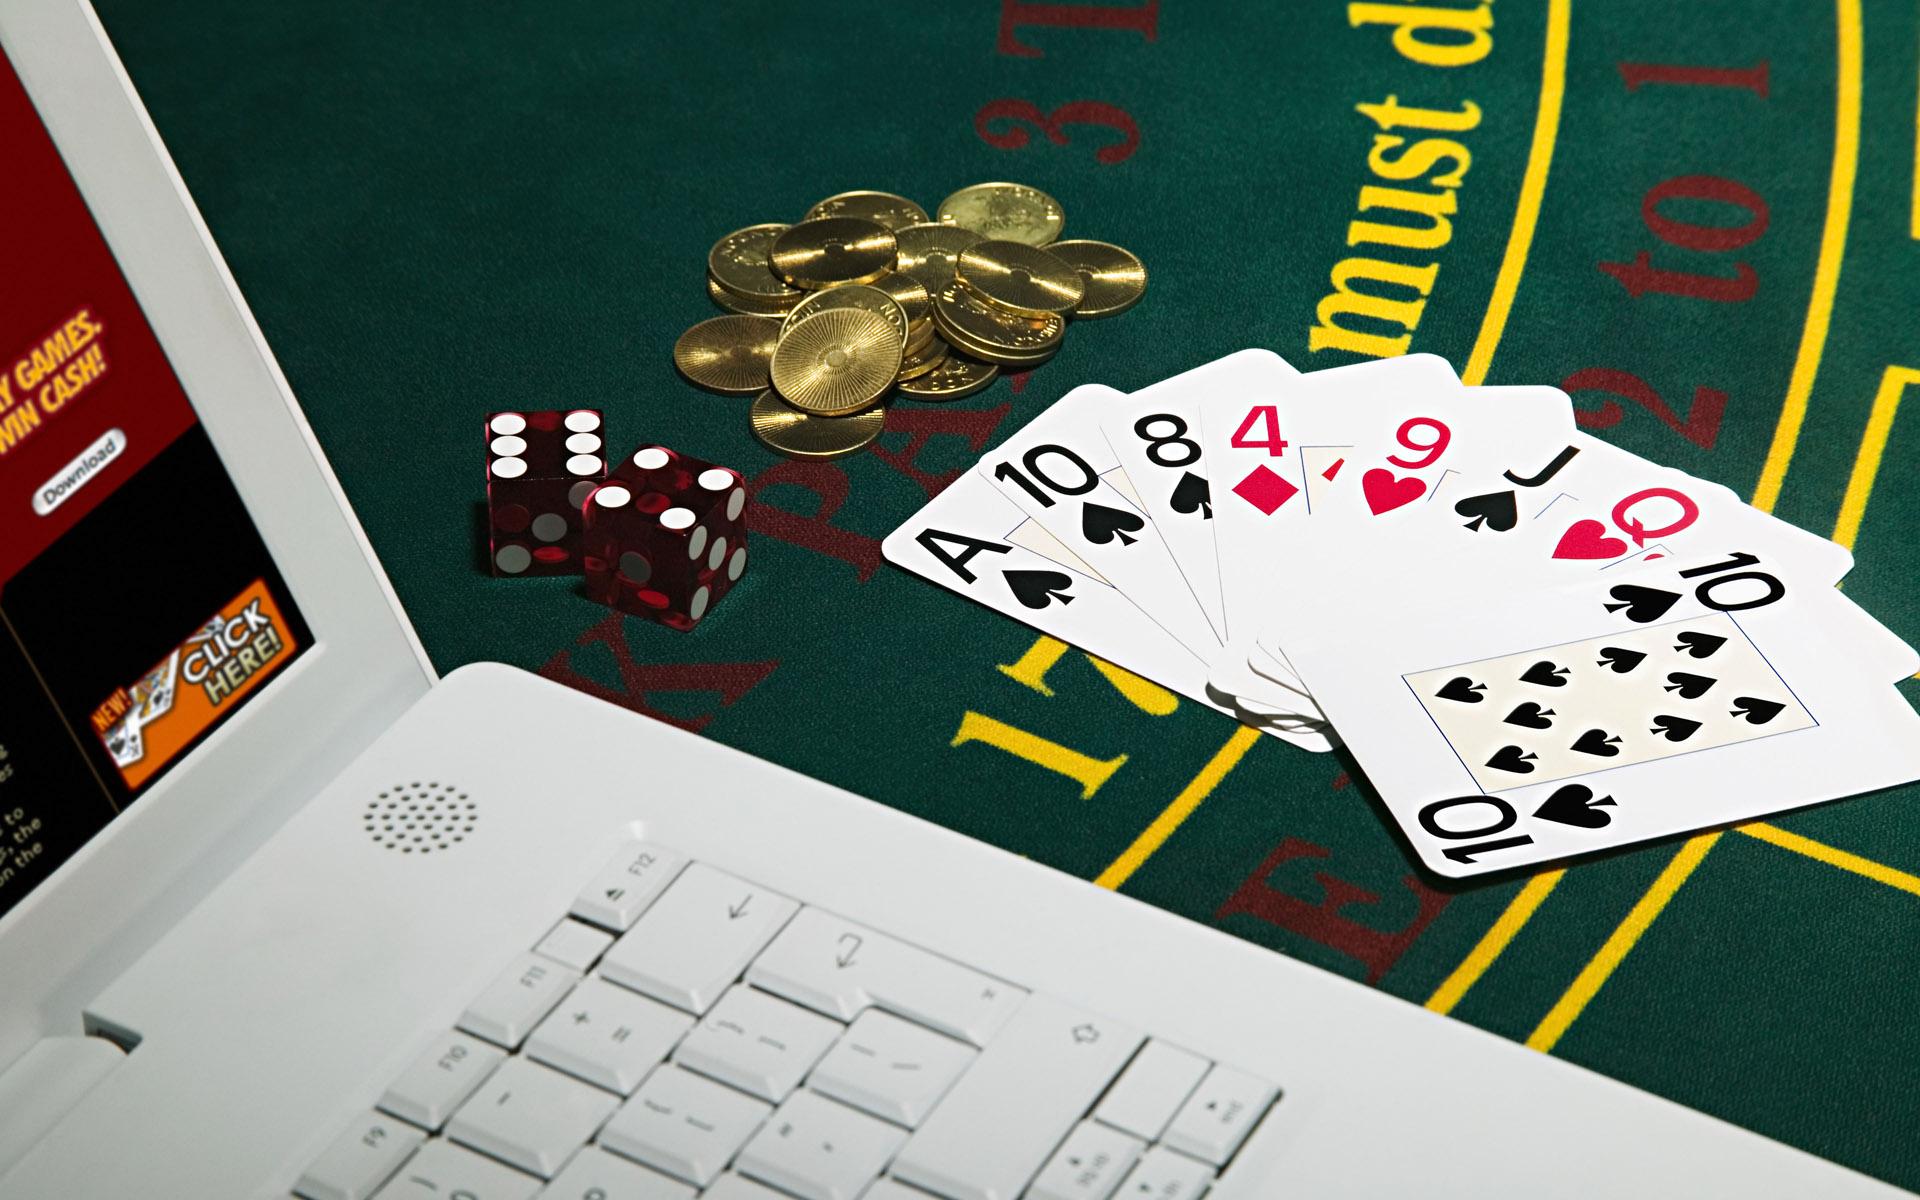 Бизнесс-план интернет-казино terminai17 как найти лазейку в интернет казино